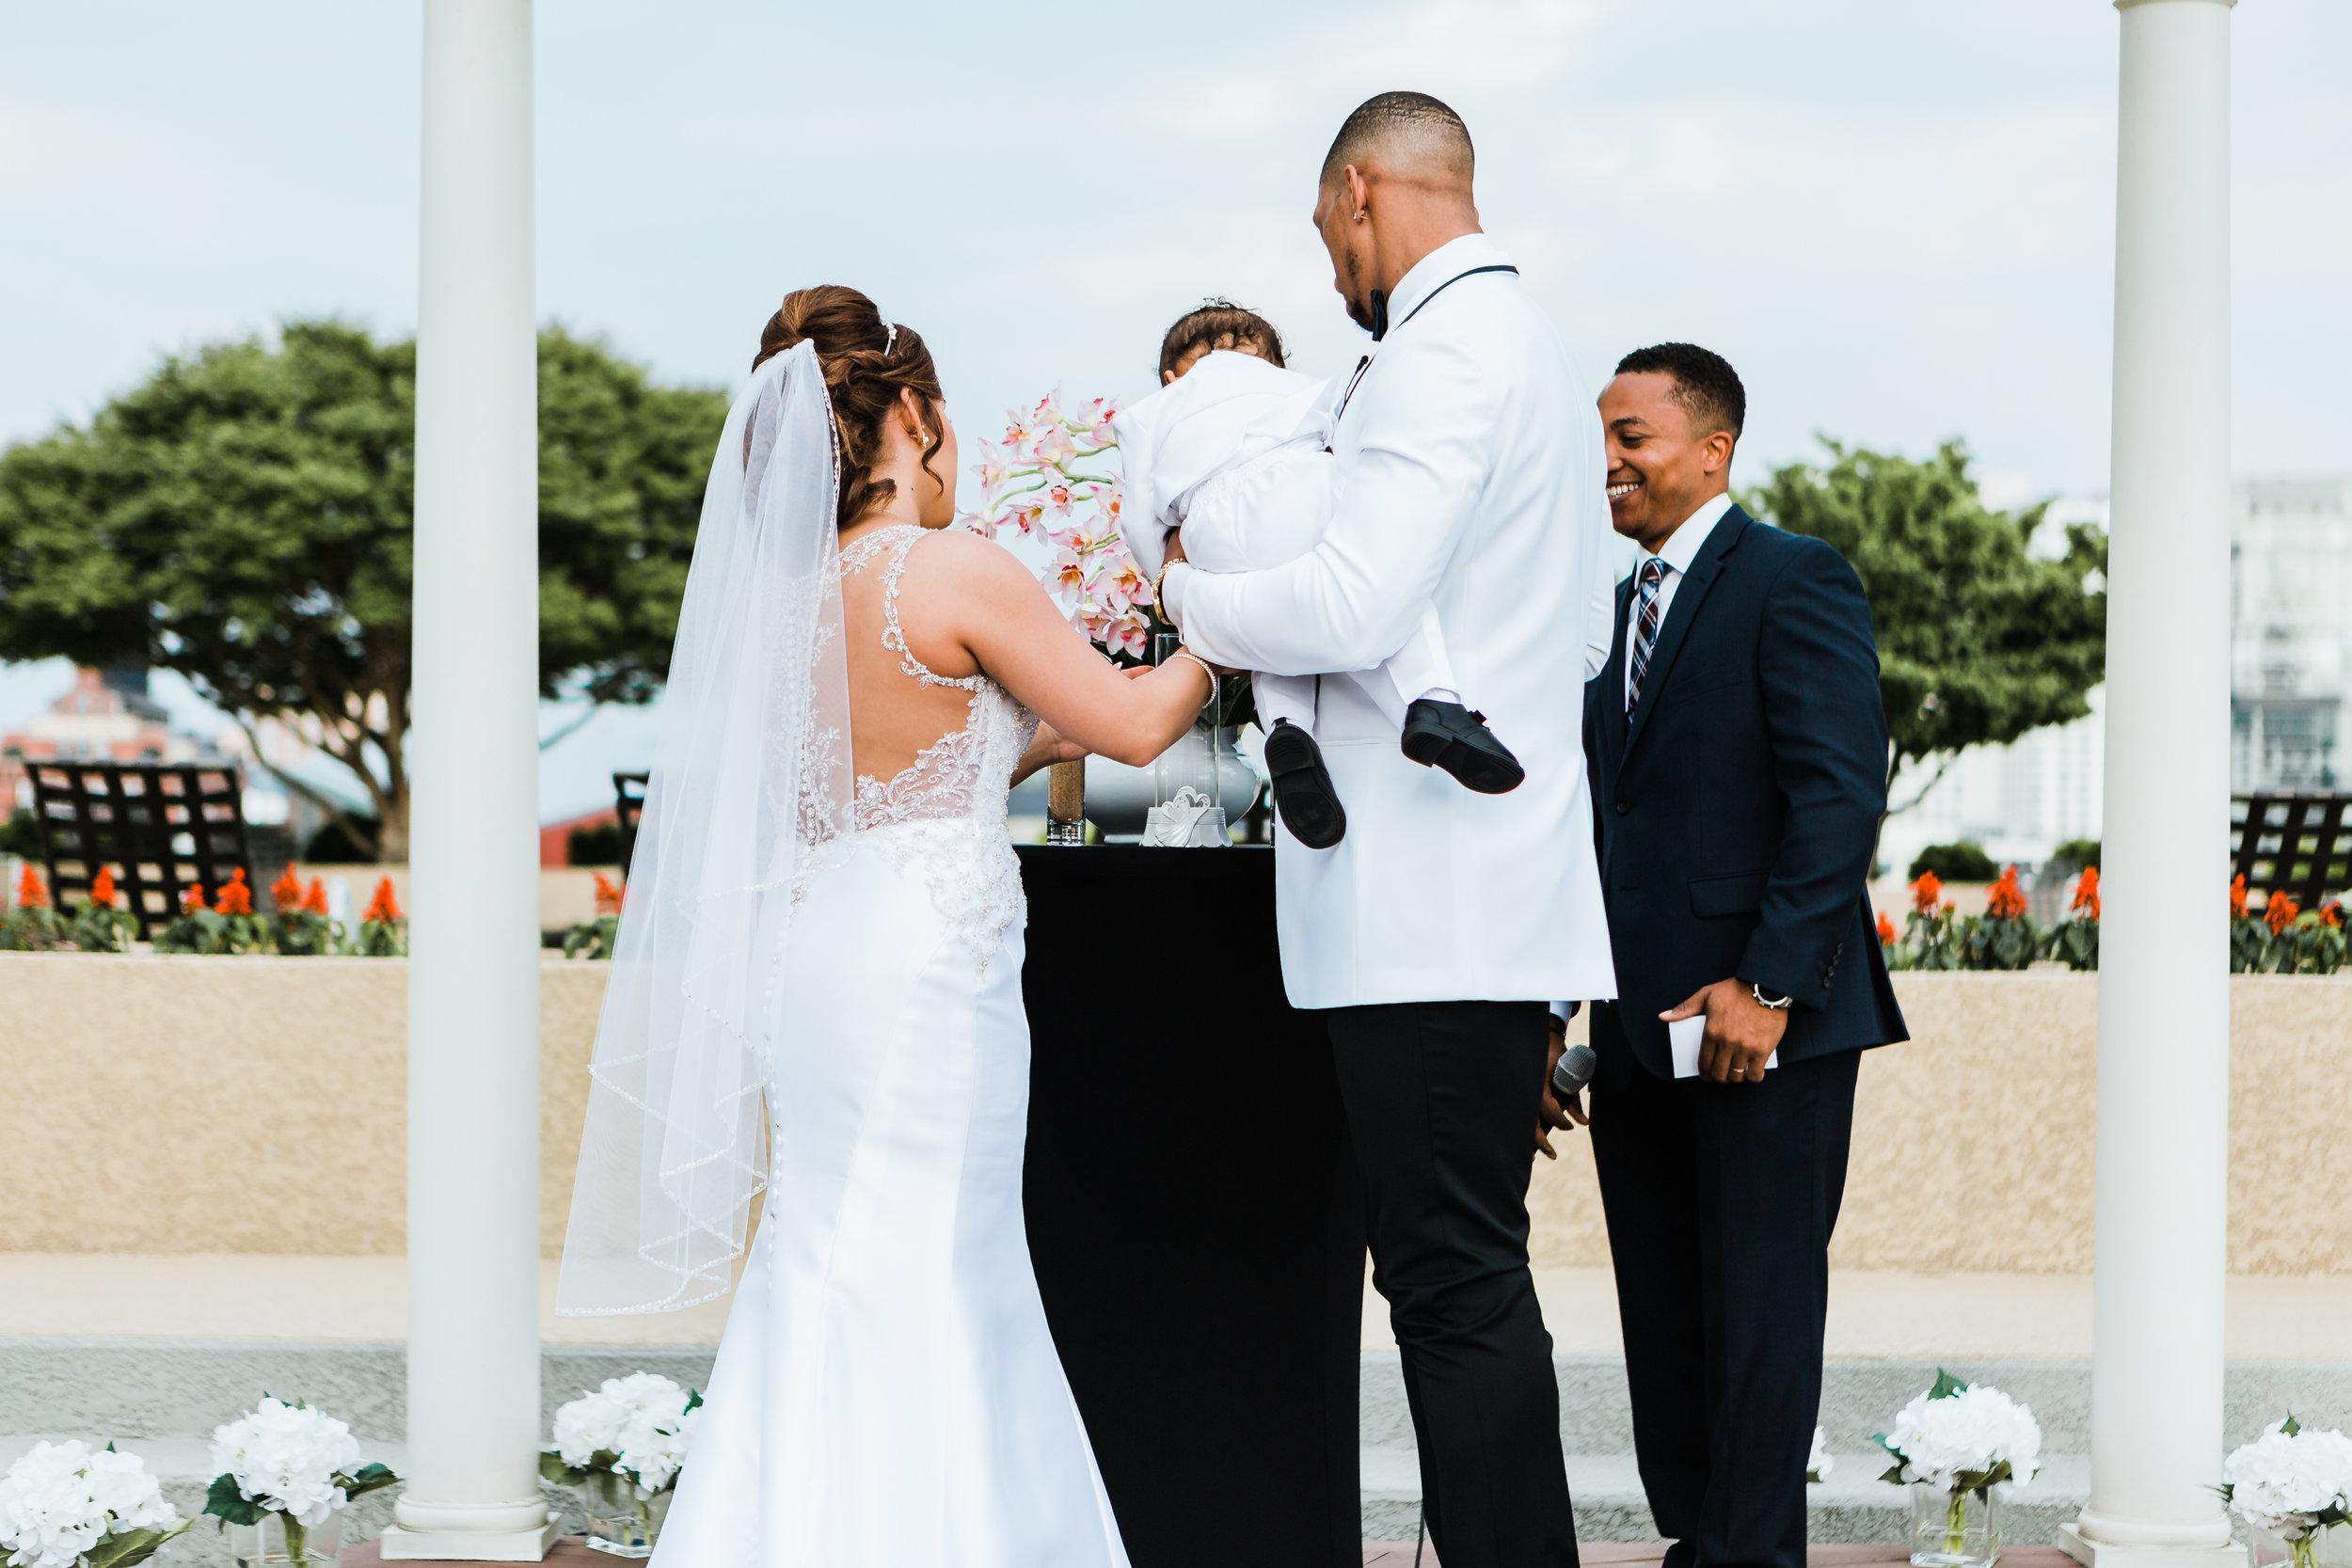 sand ceremony on hotel rooftop baltimore maryland wedding photographer